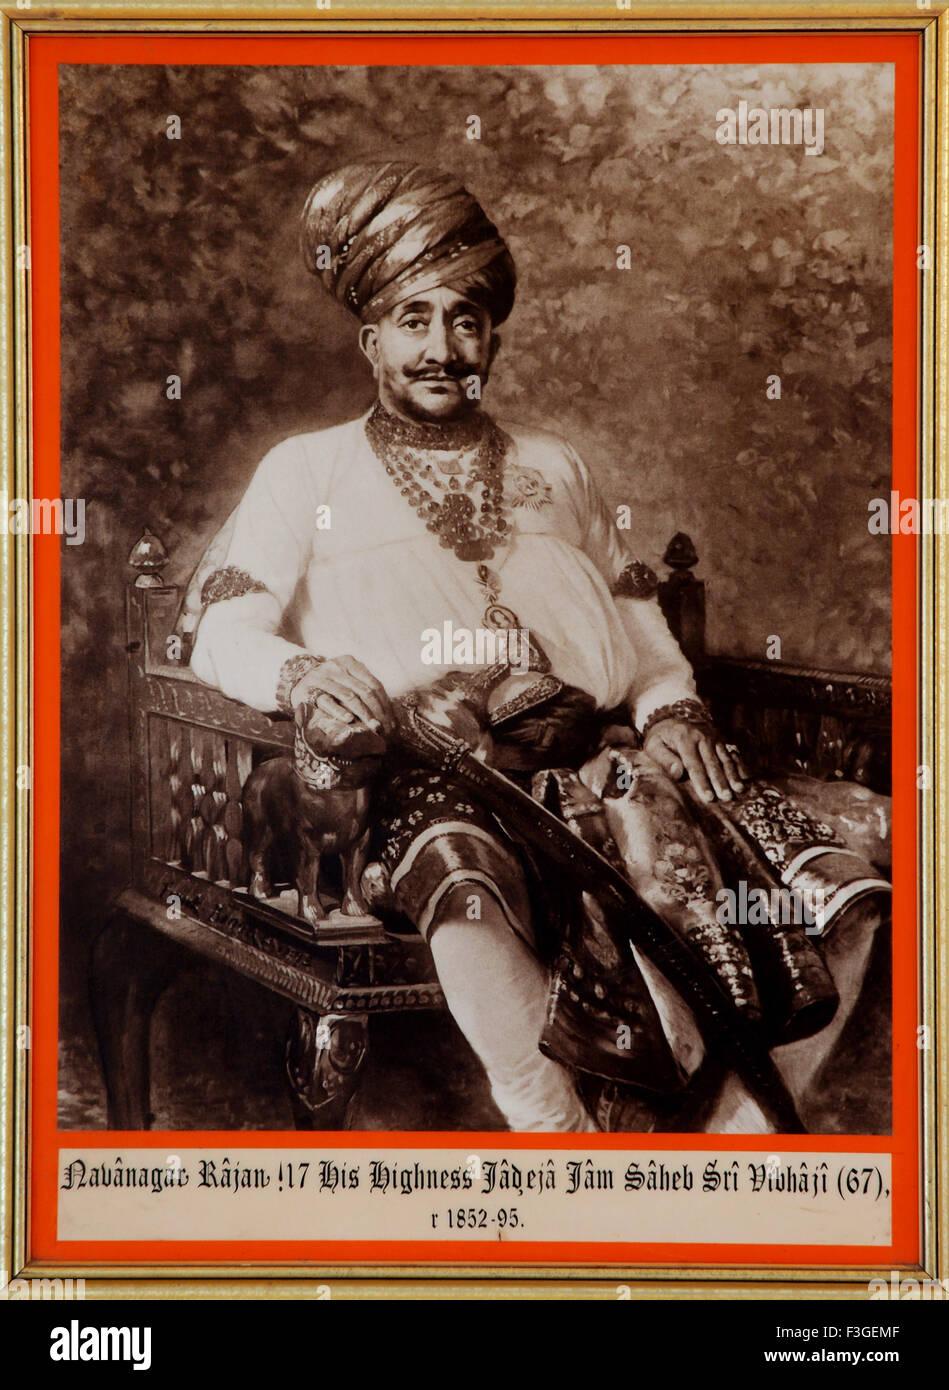 Painting and old royal portrait of Javanagar Rajan 17 his highness Jadeja Jam Saheb Sri Vibhai Ji 67 1852 95 ; Gujarat - Stock Image